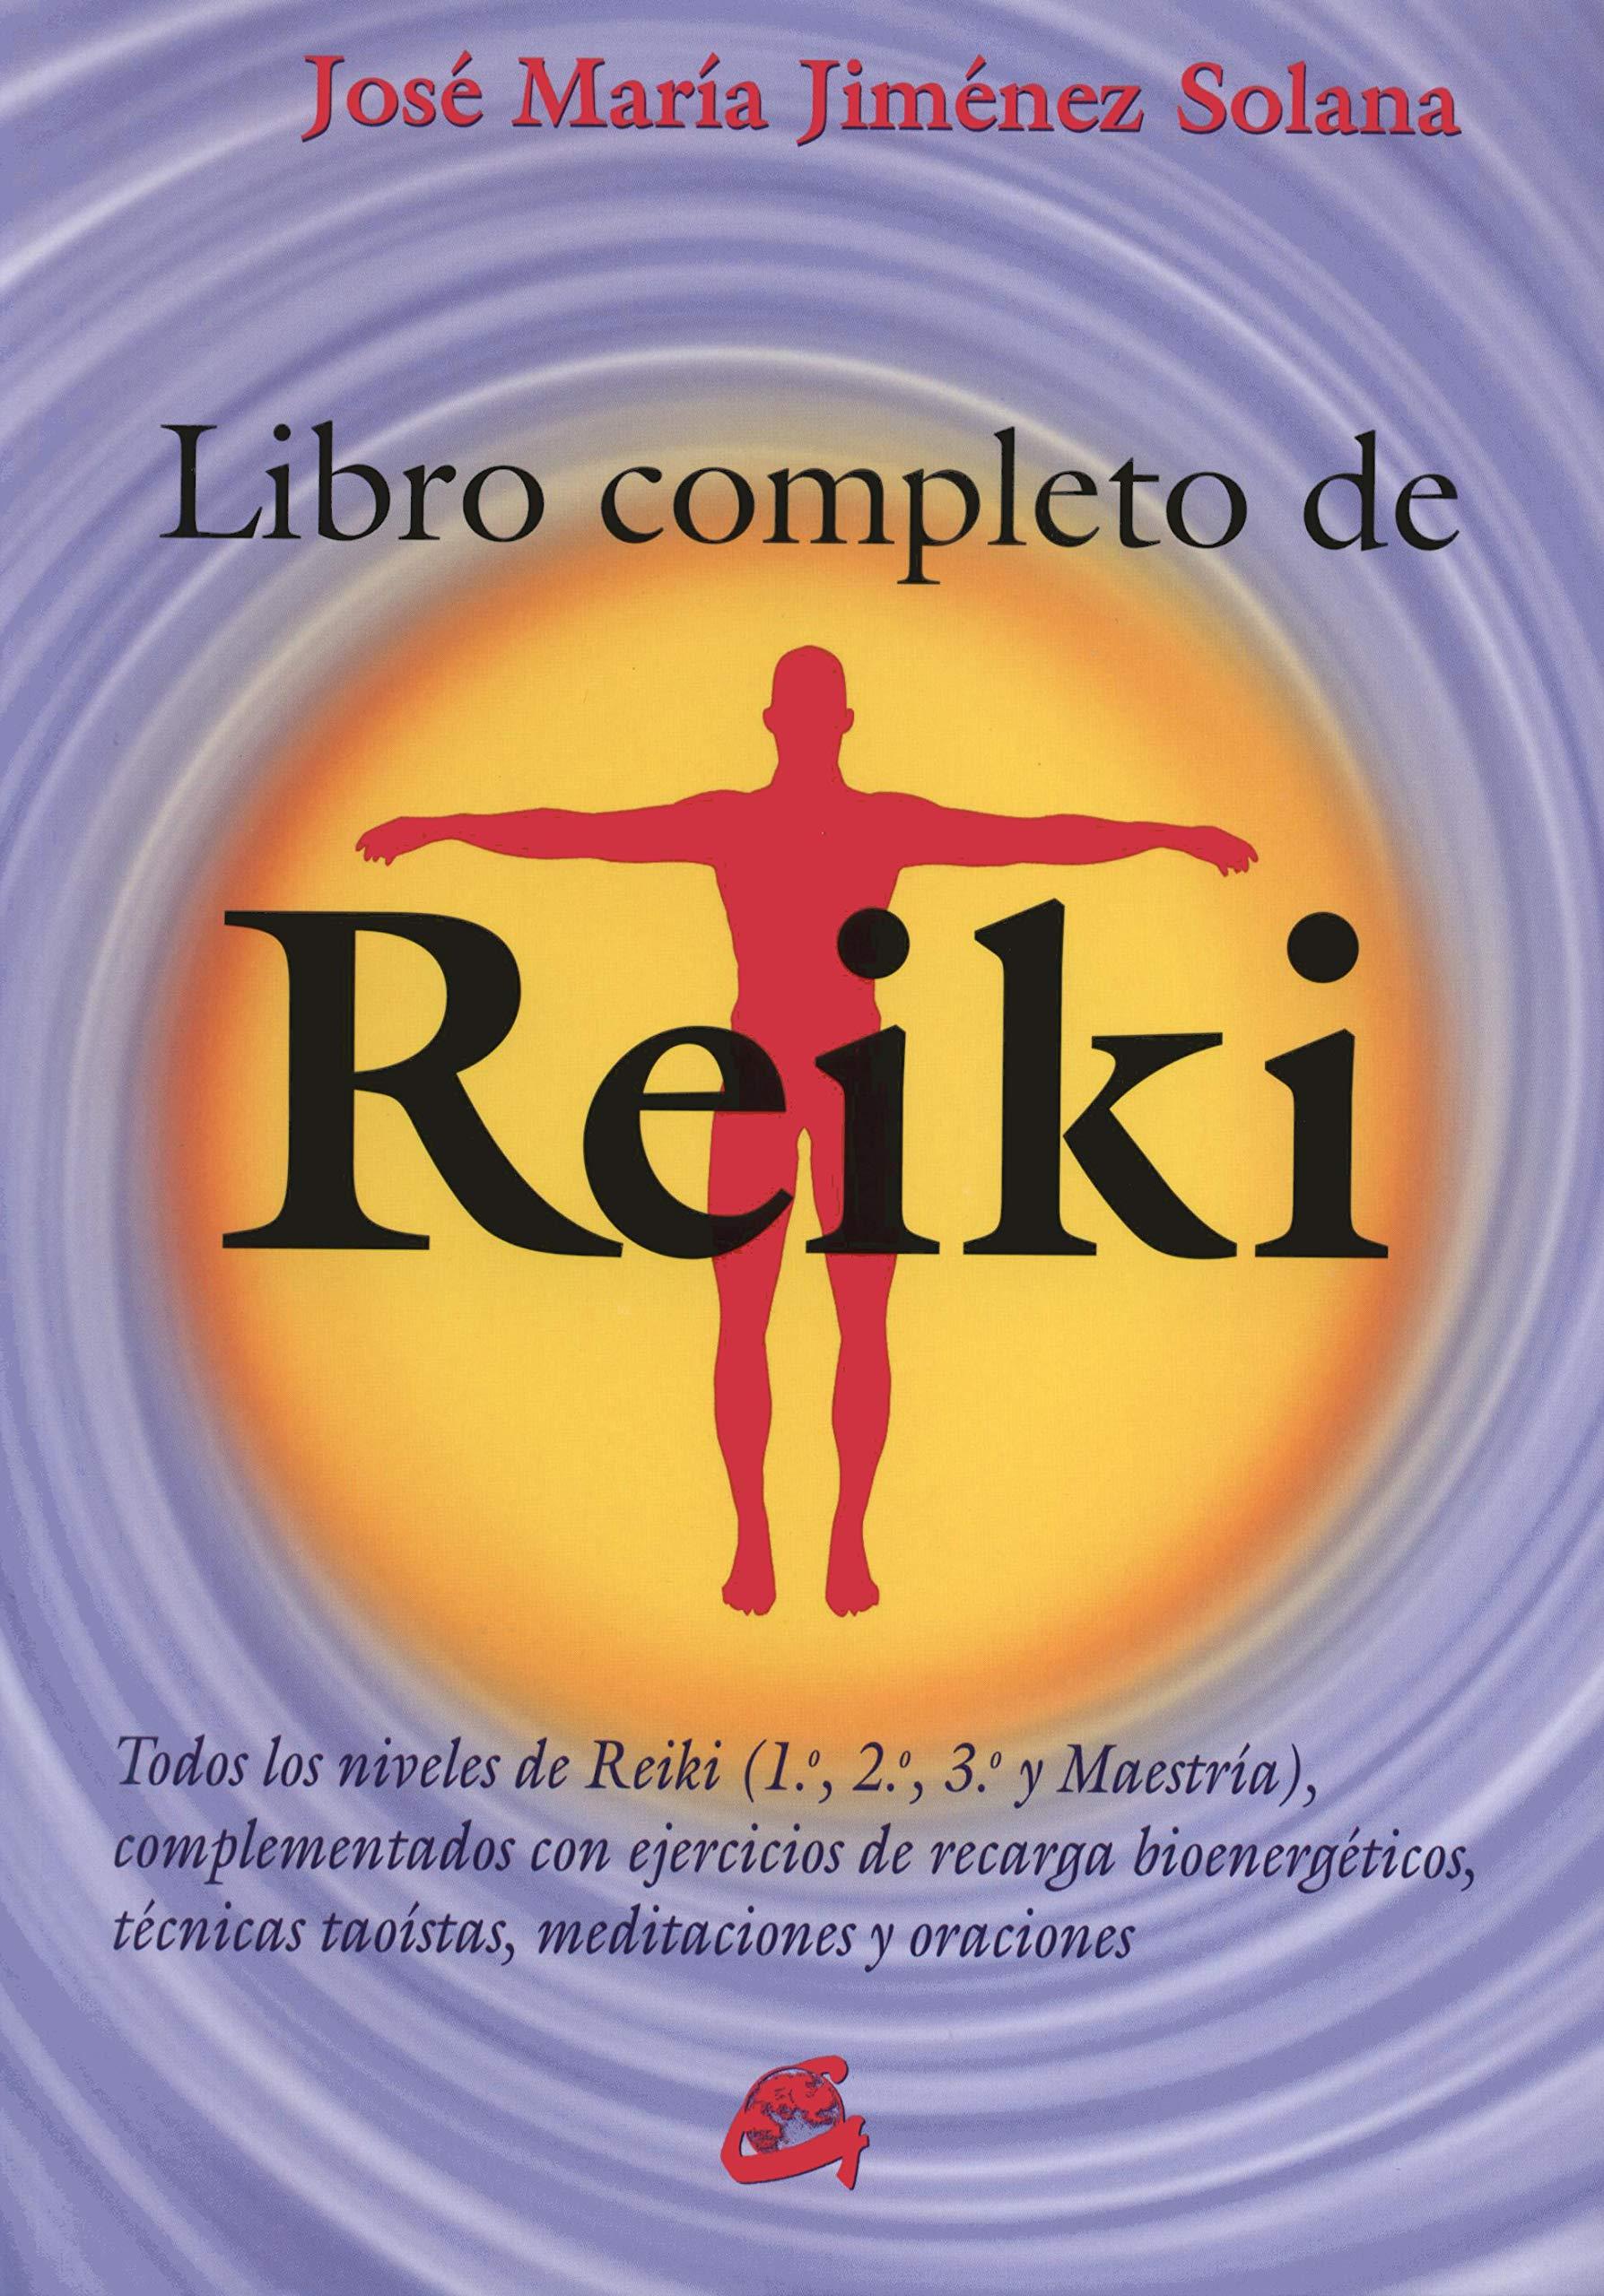 Amazon.com: Libro completo de Reiki (Formato grande ...